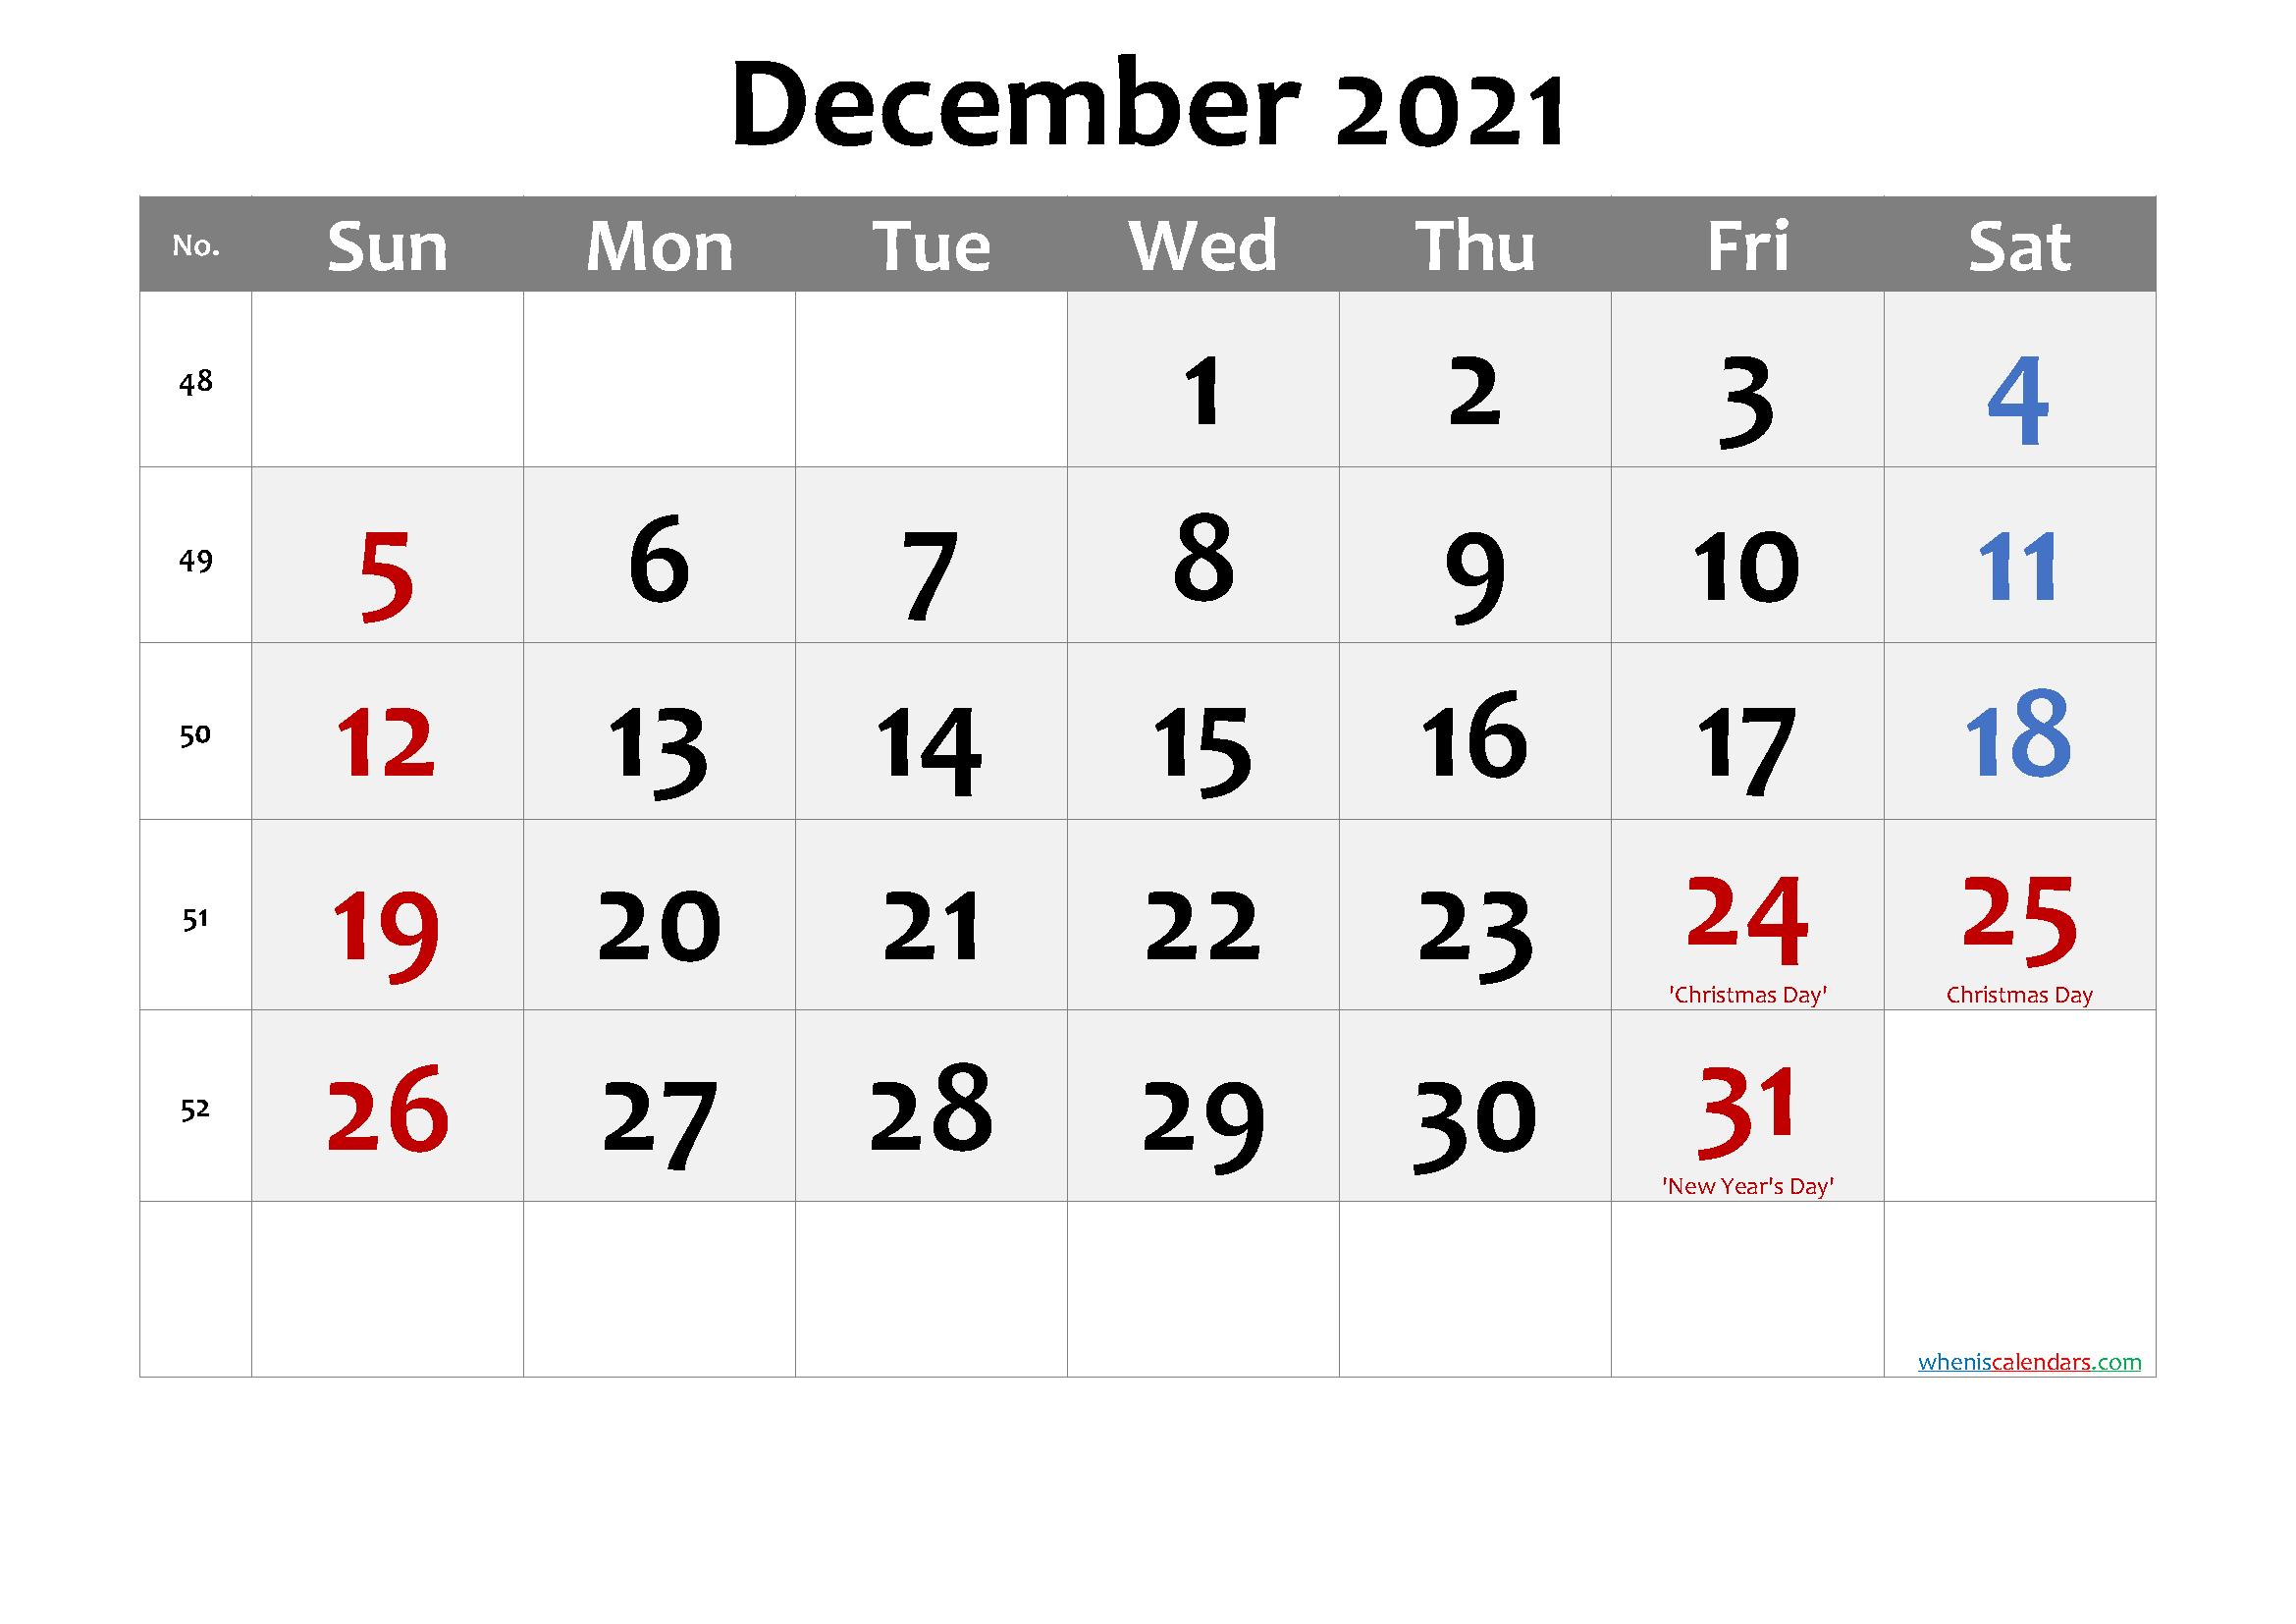 December 2021 Calendar With Holidays | Printable Calendars